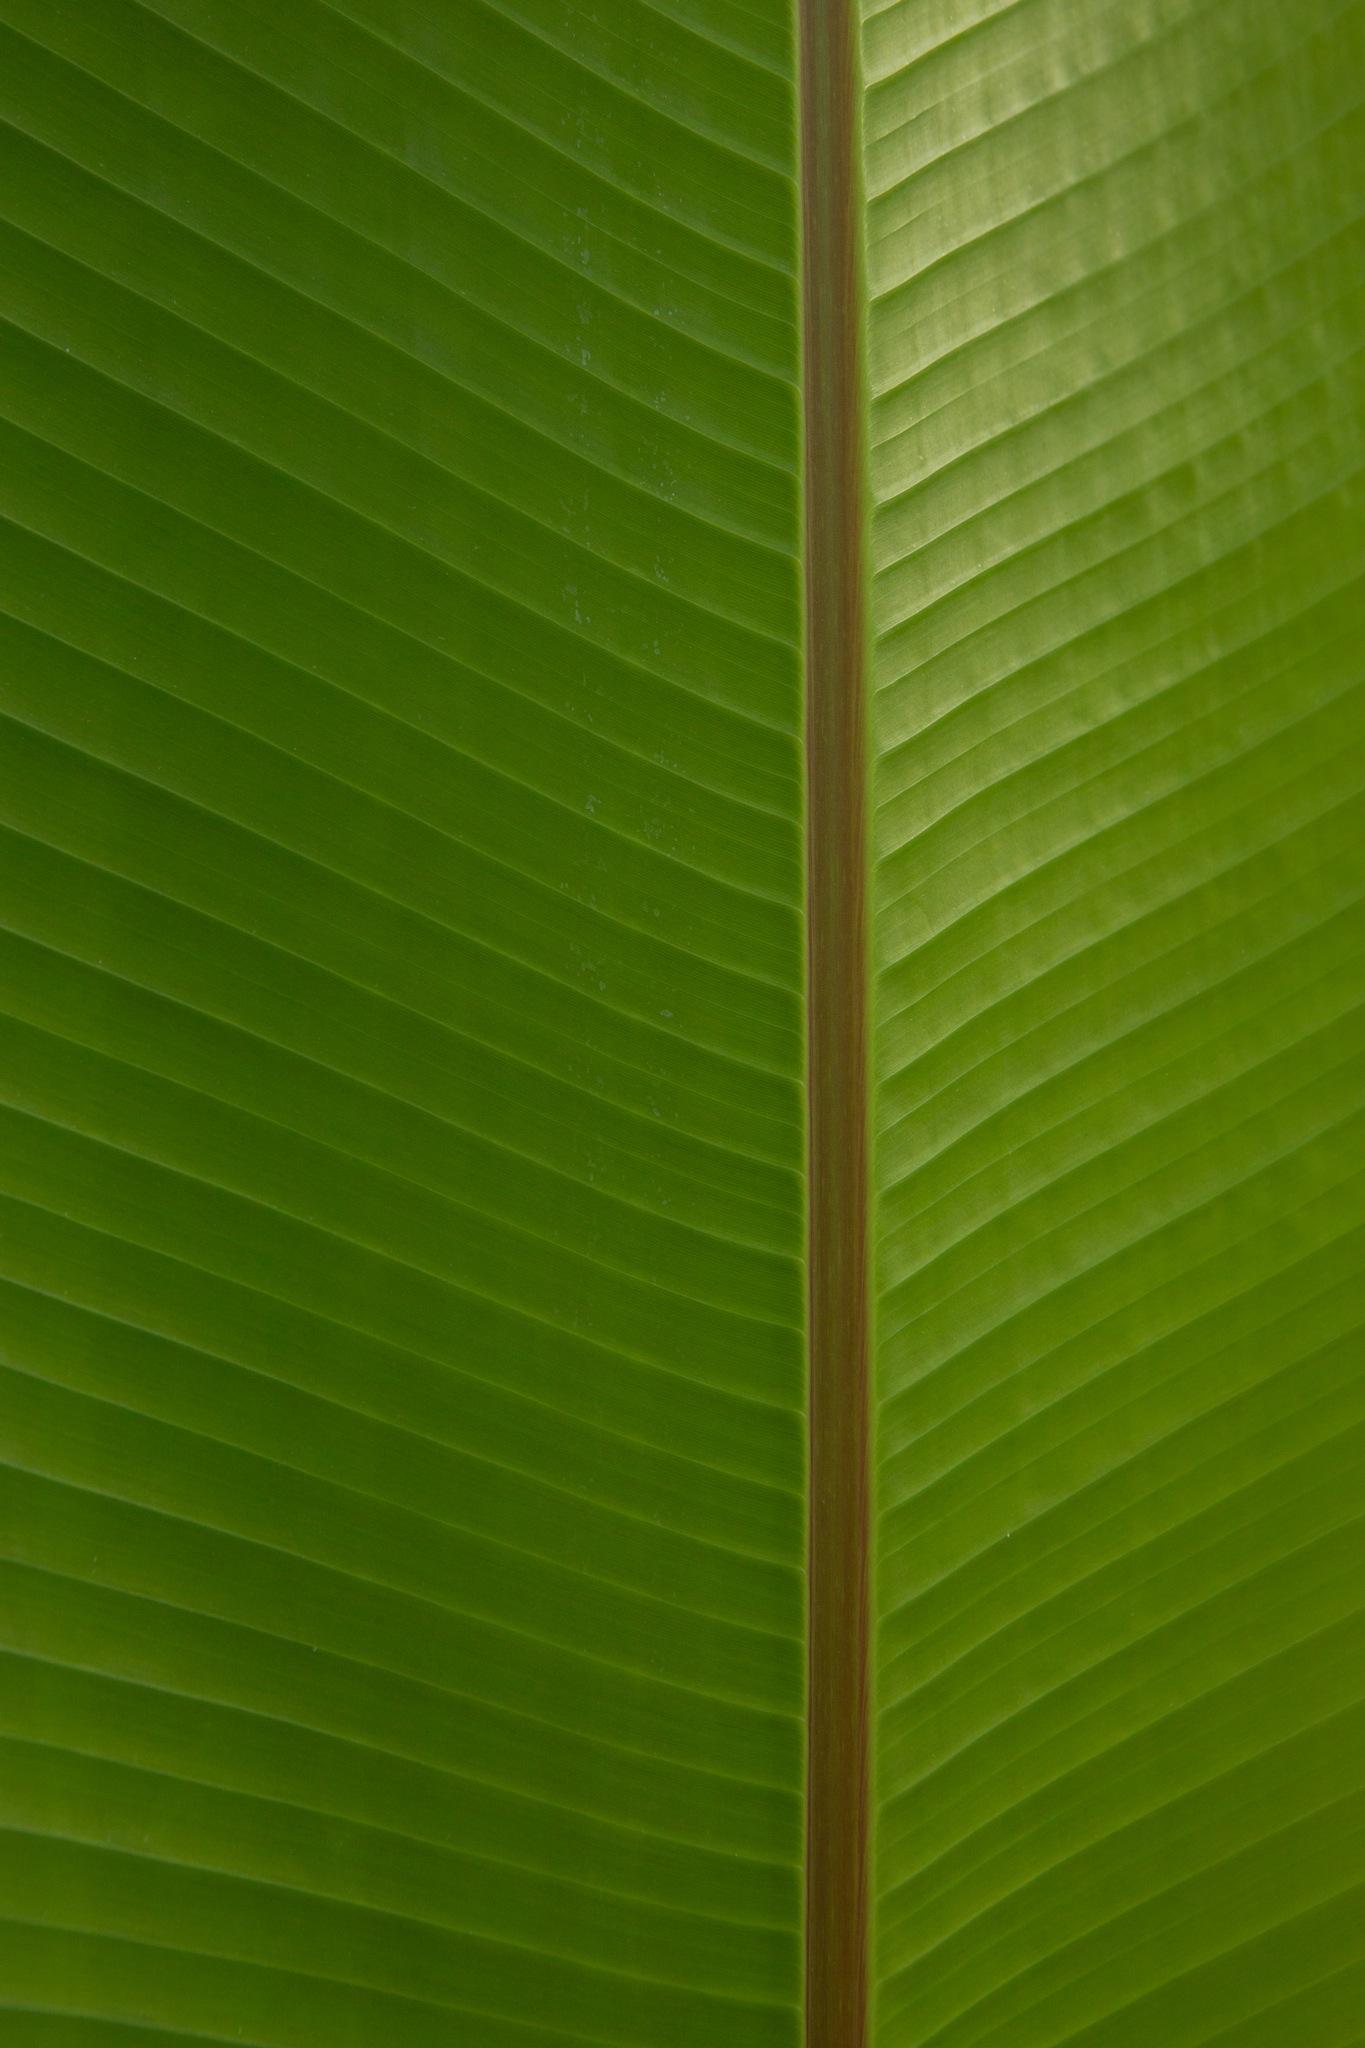 Leaf Texture by John Watson